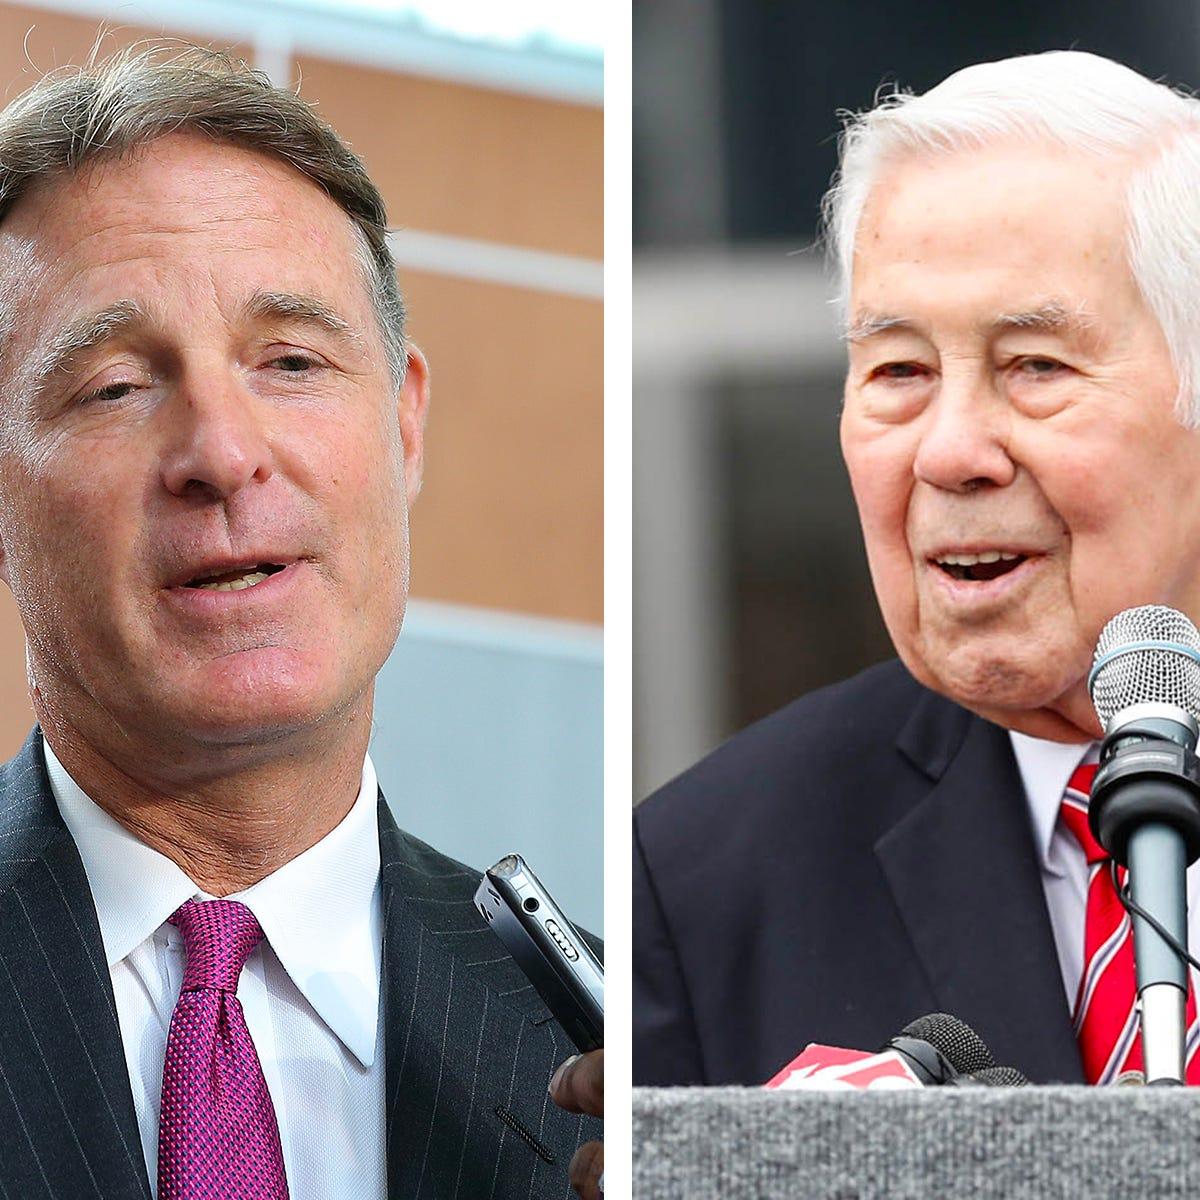 Former senators Evan Bayh (left) and Richard Lugar are among 44 former U.S. senators who wrote an open  letter published in The Washington Post.